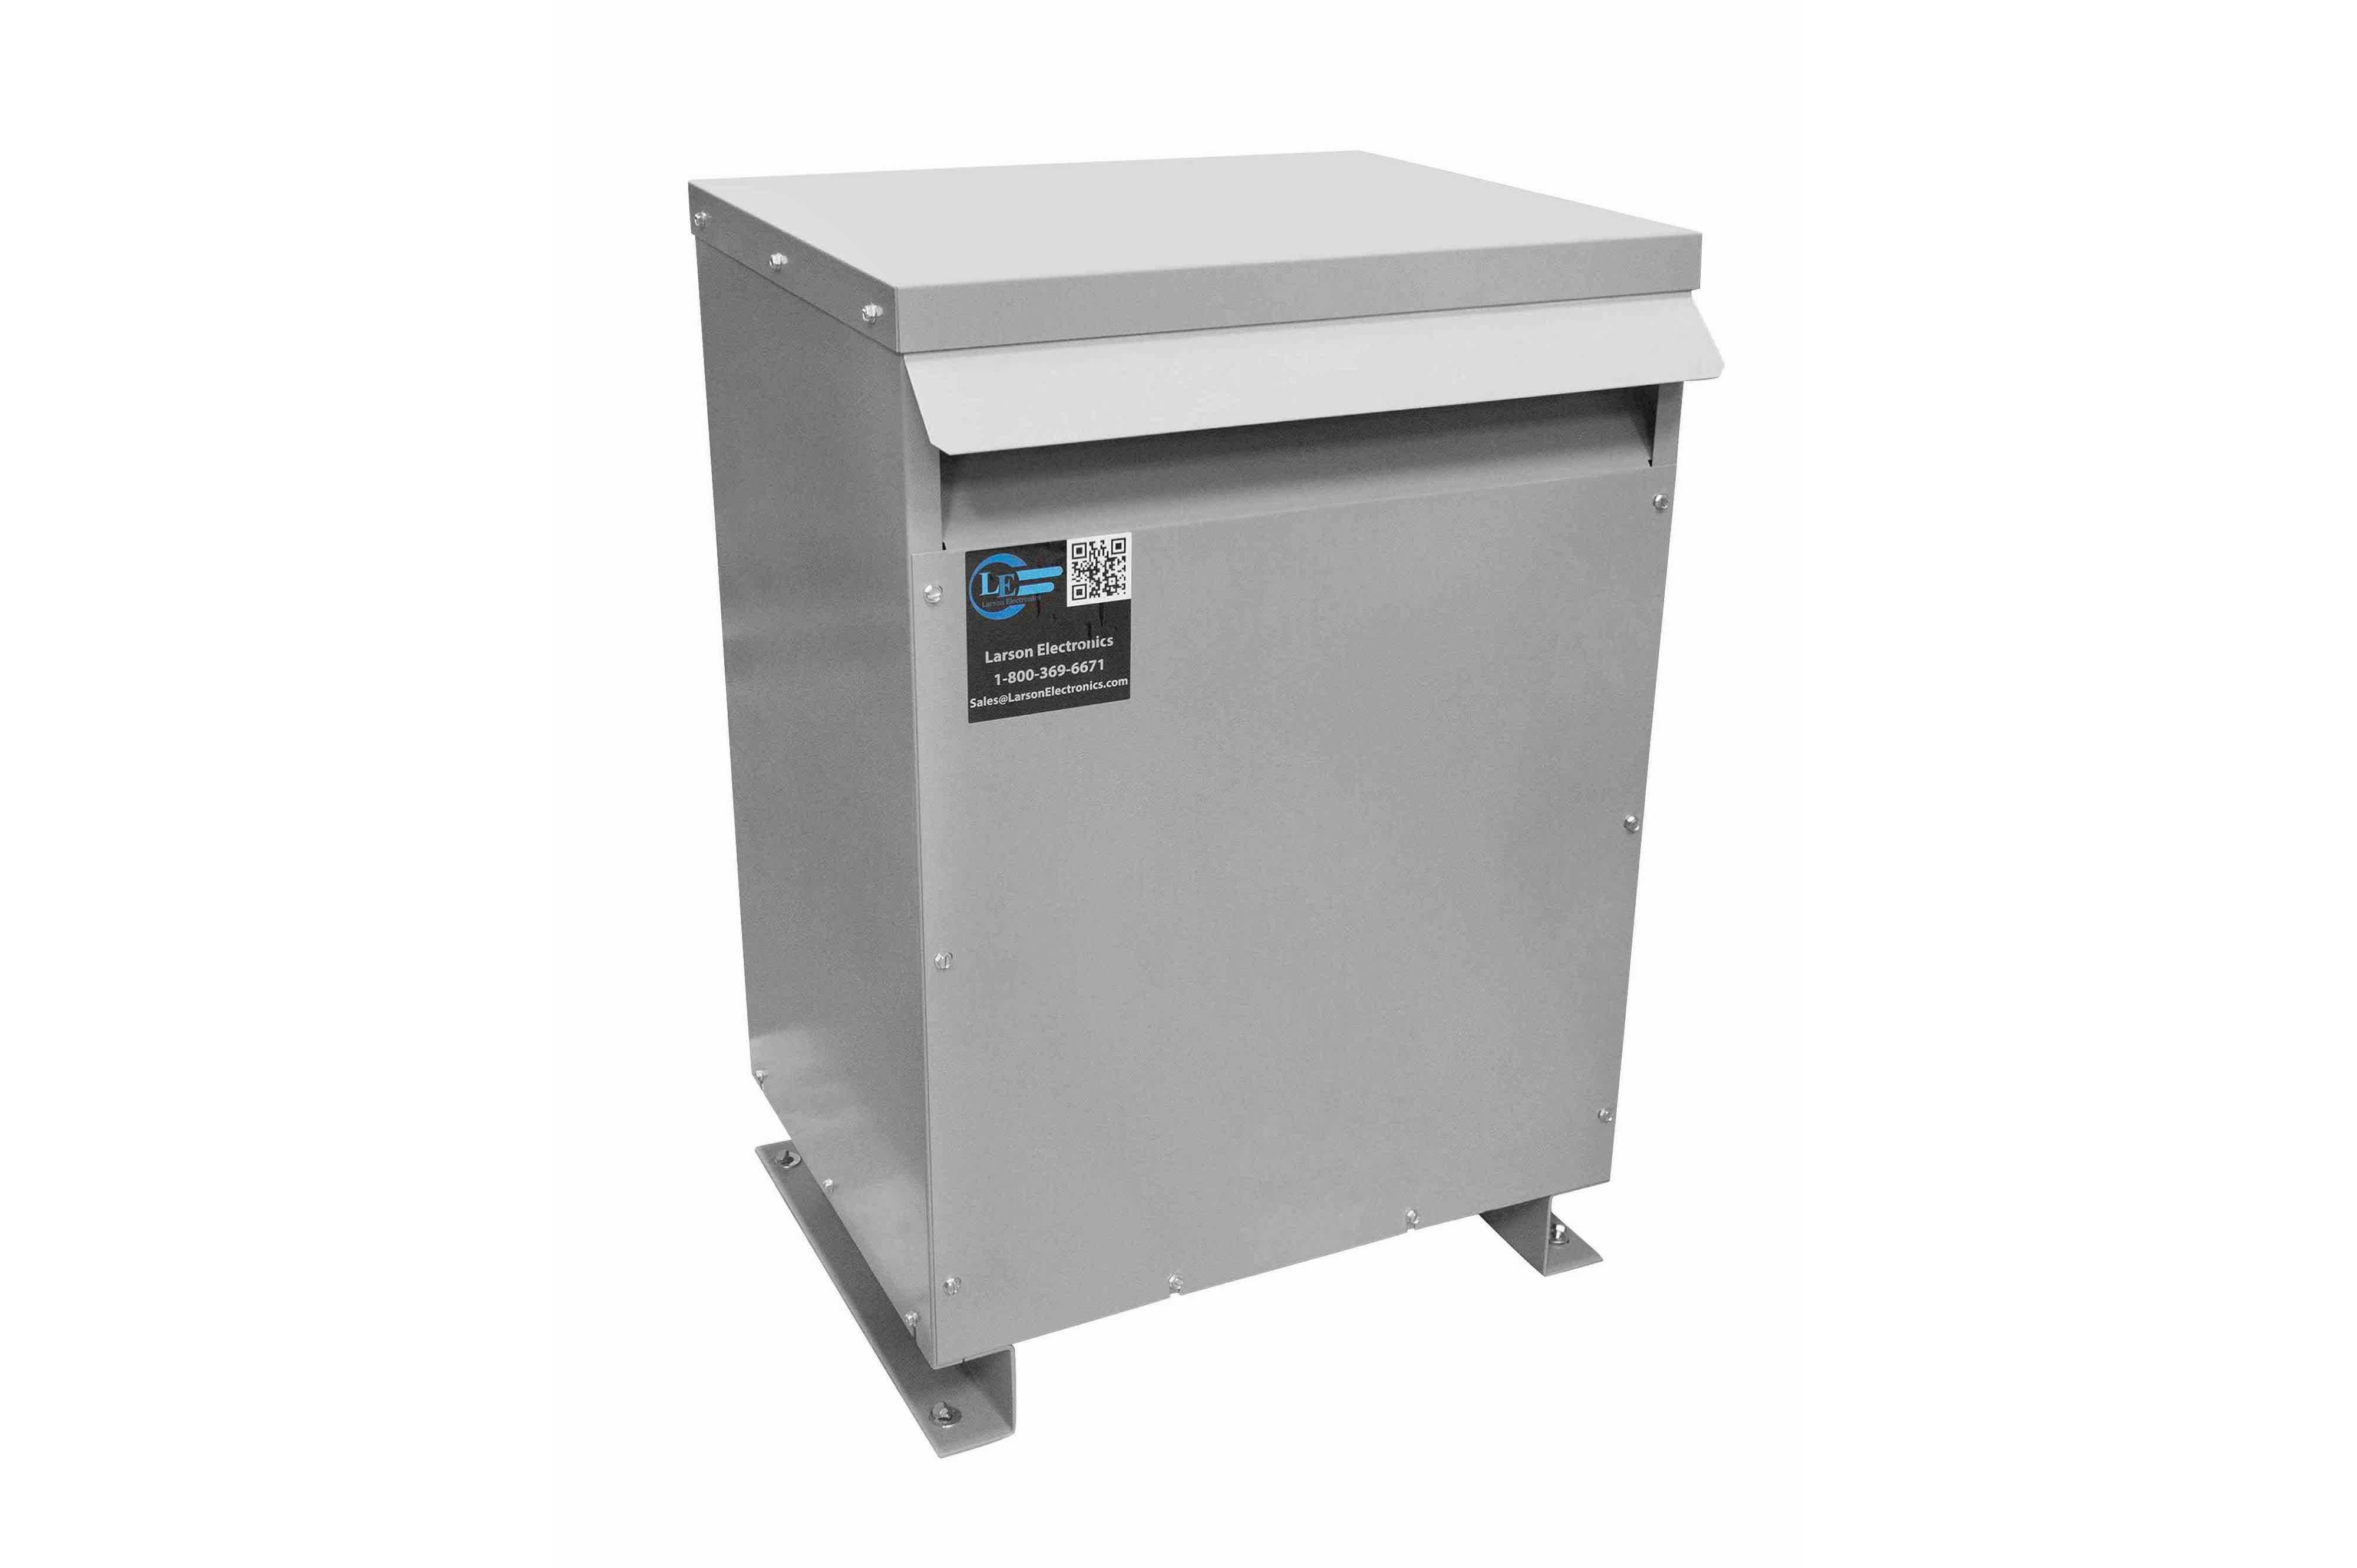 65 kVA 3PH Isolation Transformer, 415V Wye Primary, 600V Delta Secondary, N3R, Ventilated, 60 Hz